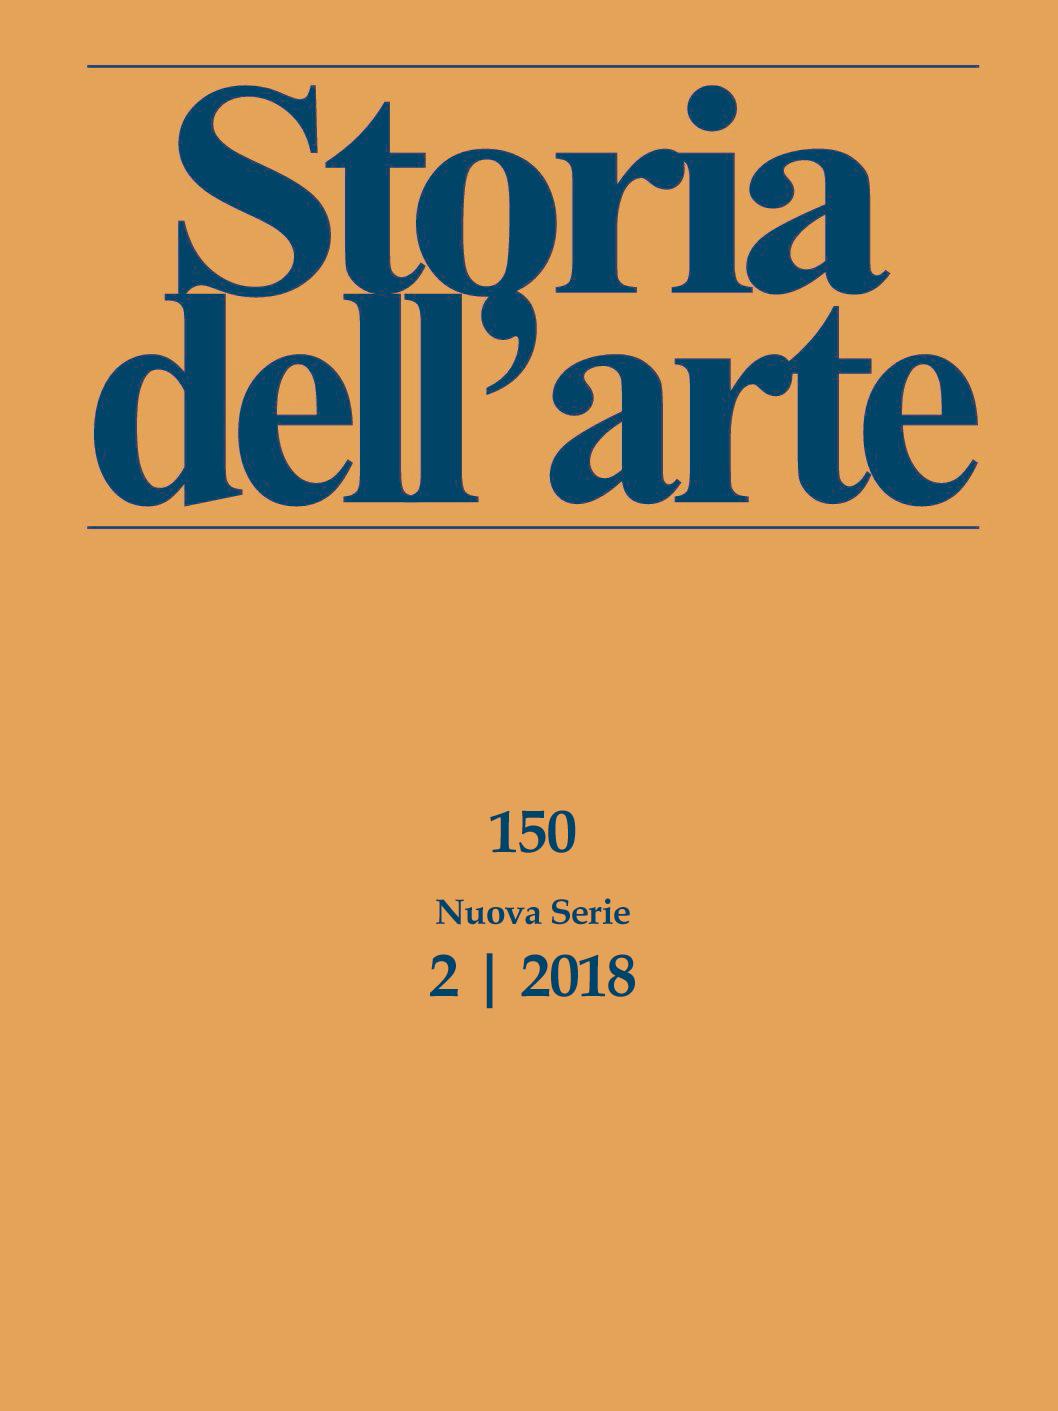 [150] Nuova Serie 2 | 2018